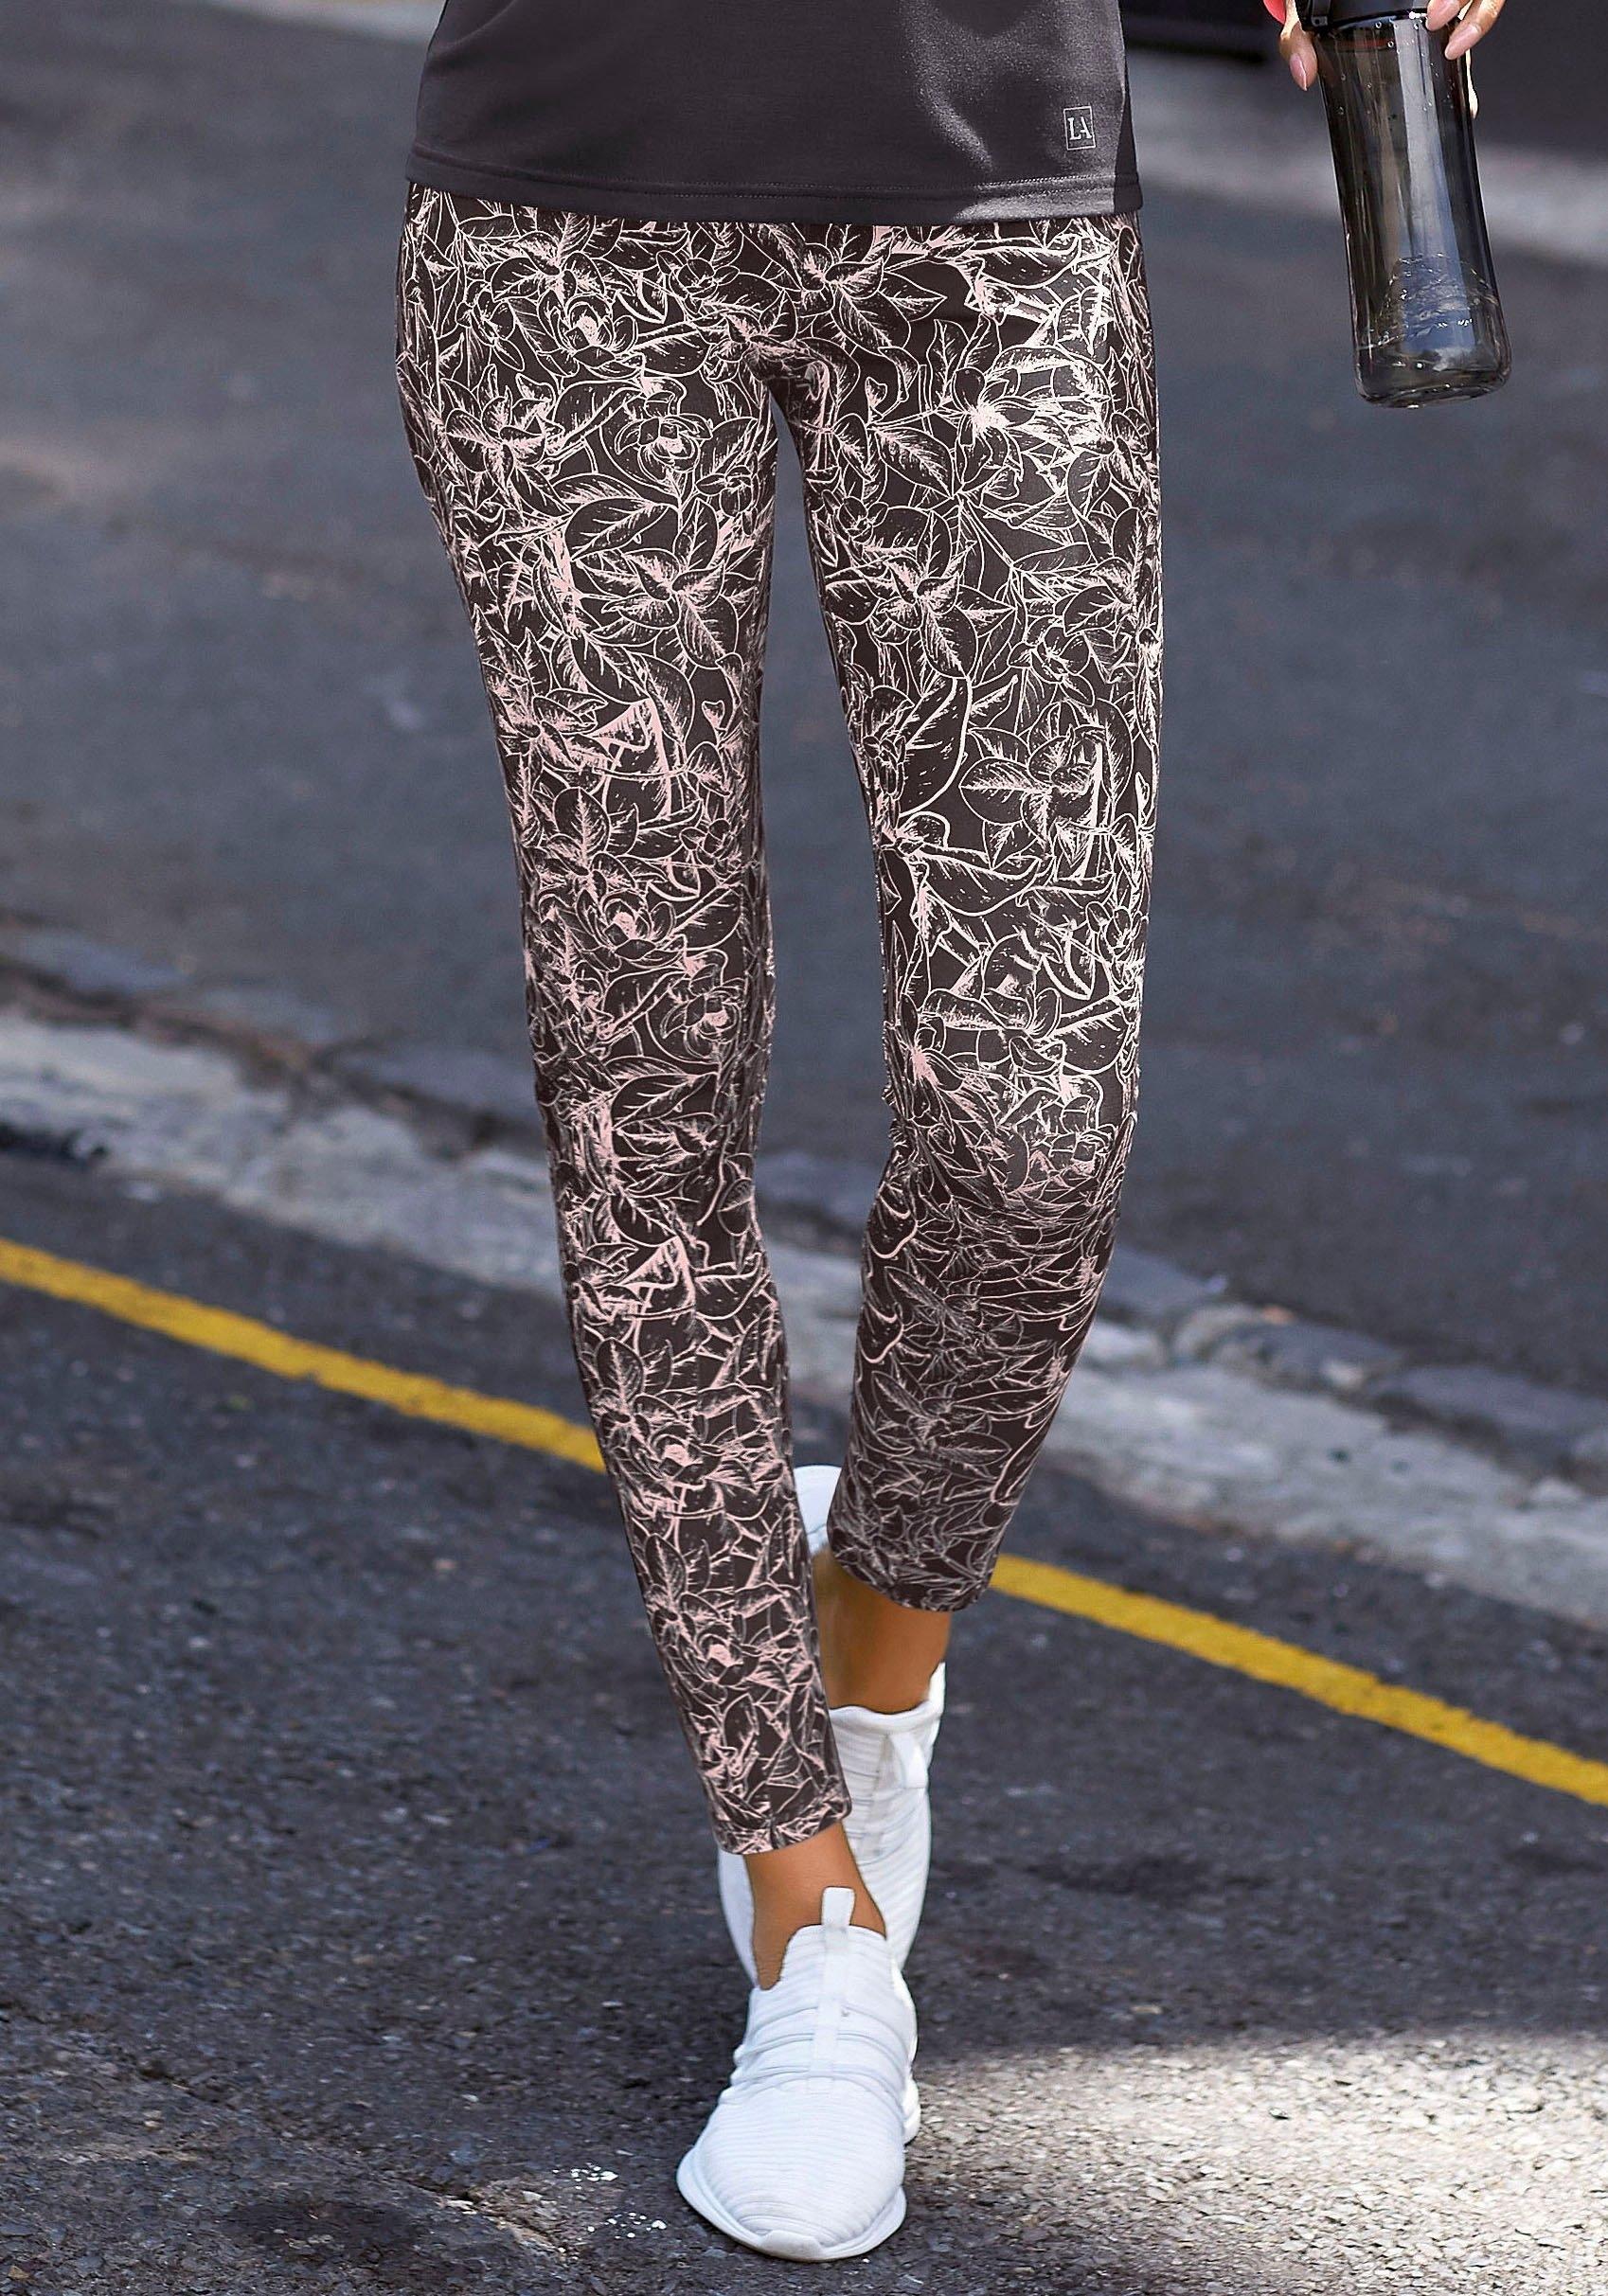 LASCANA ACTIVE legging »Lascana Leggings« - verschillende betaalmethodes